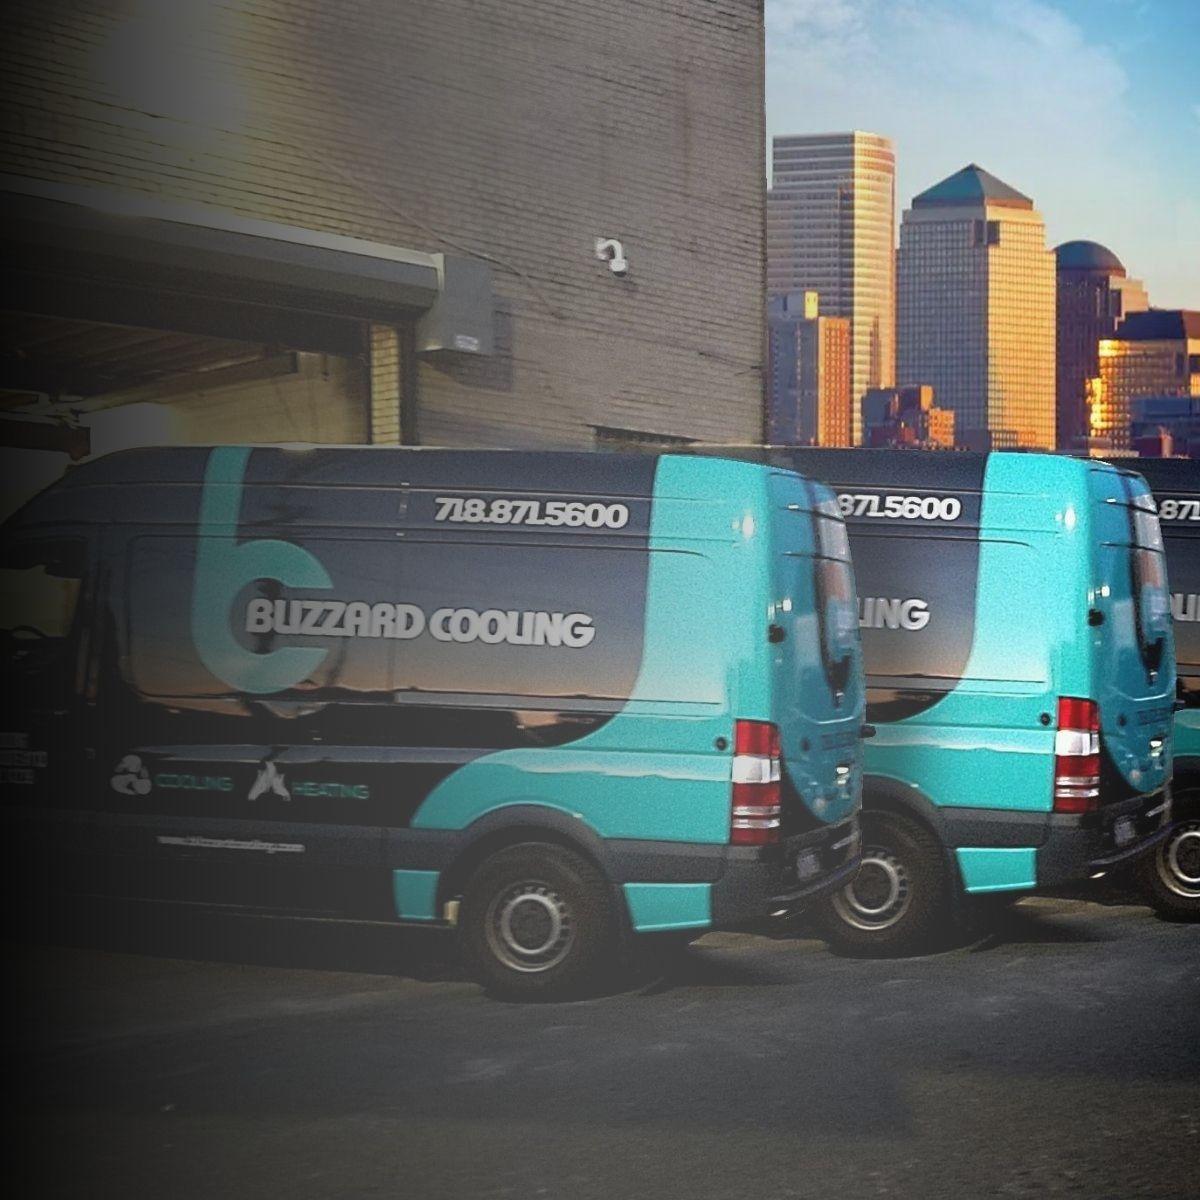 blizzard cooling vans